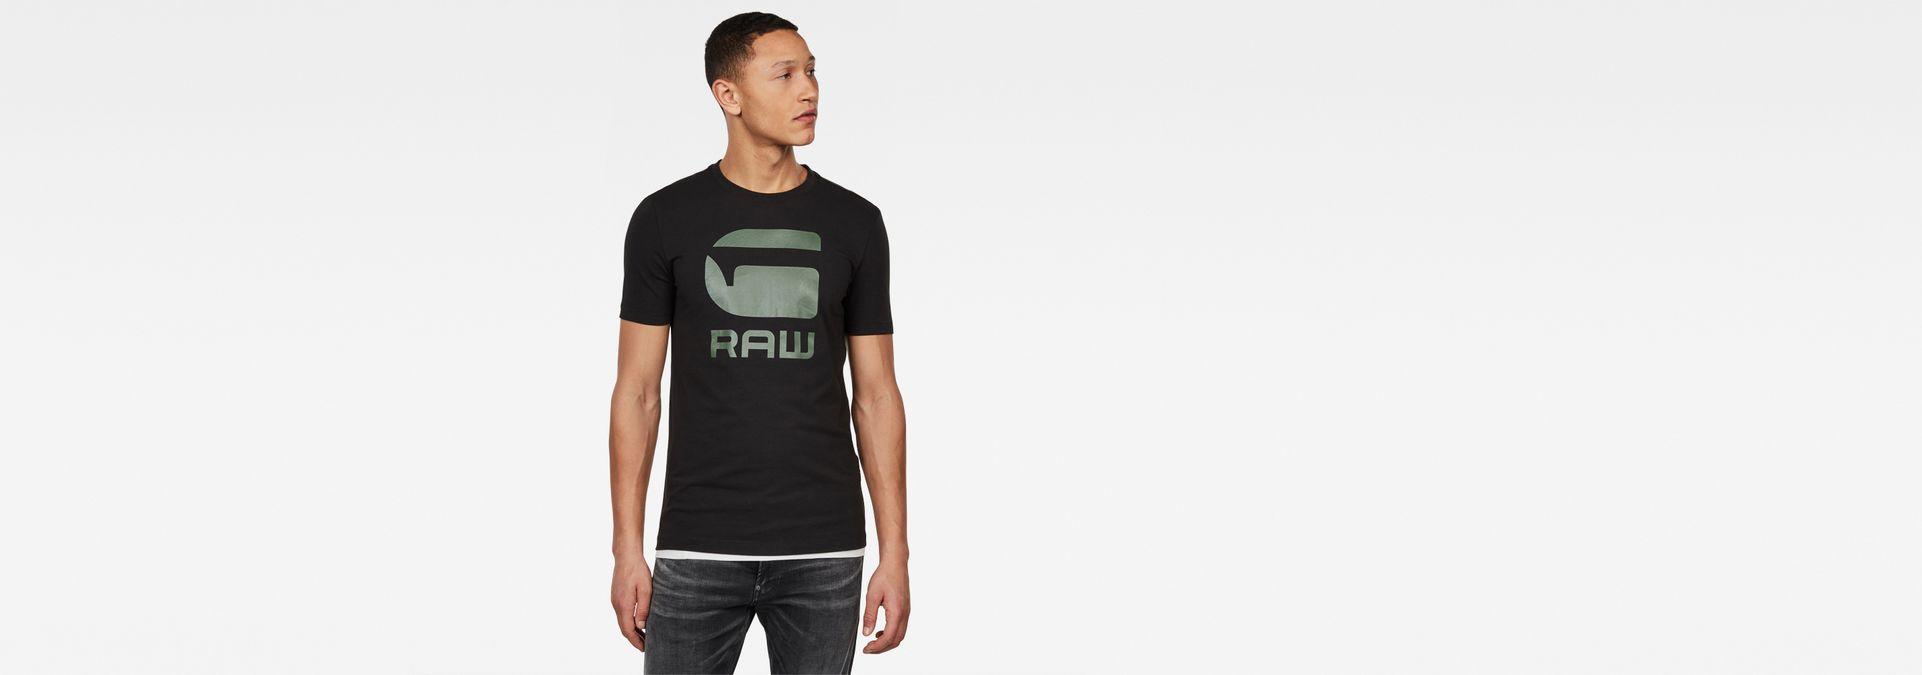 slim-g-logo-t-shirt by g-star